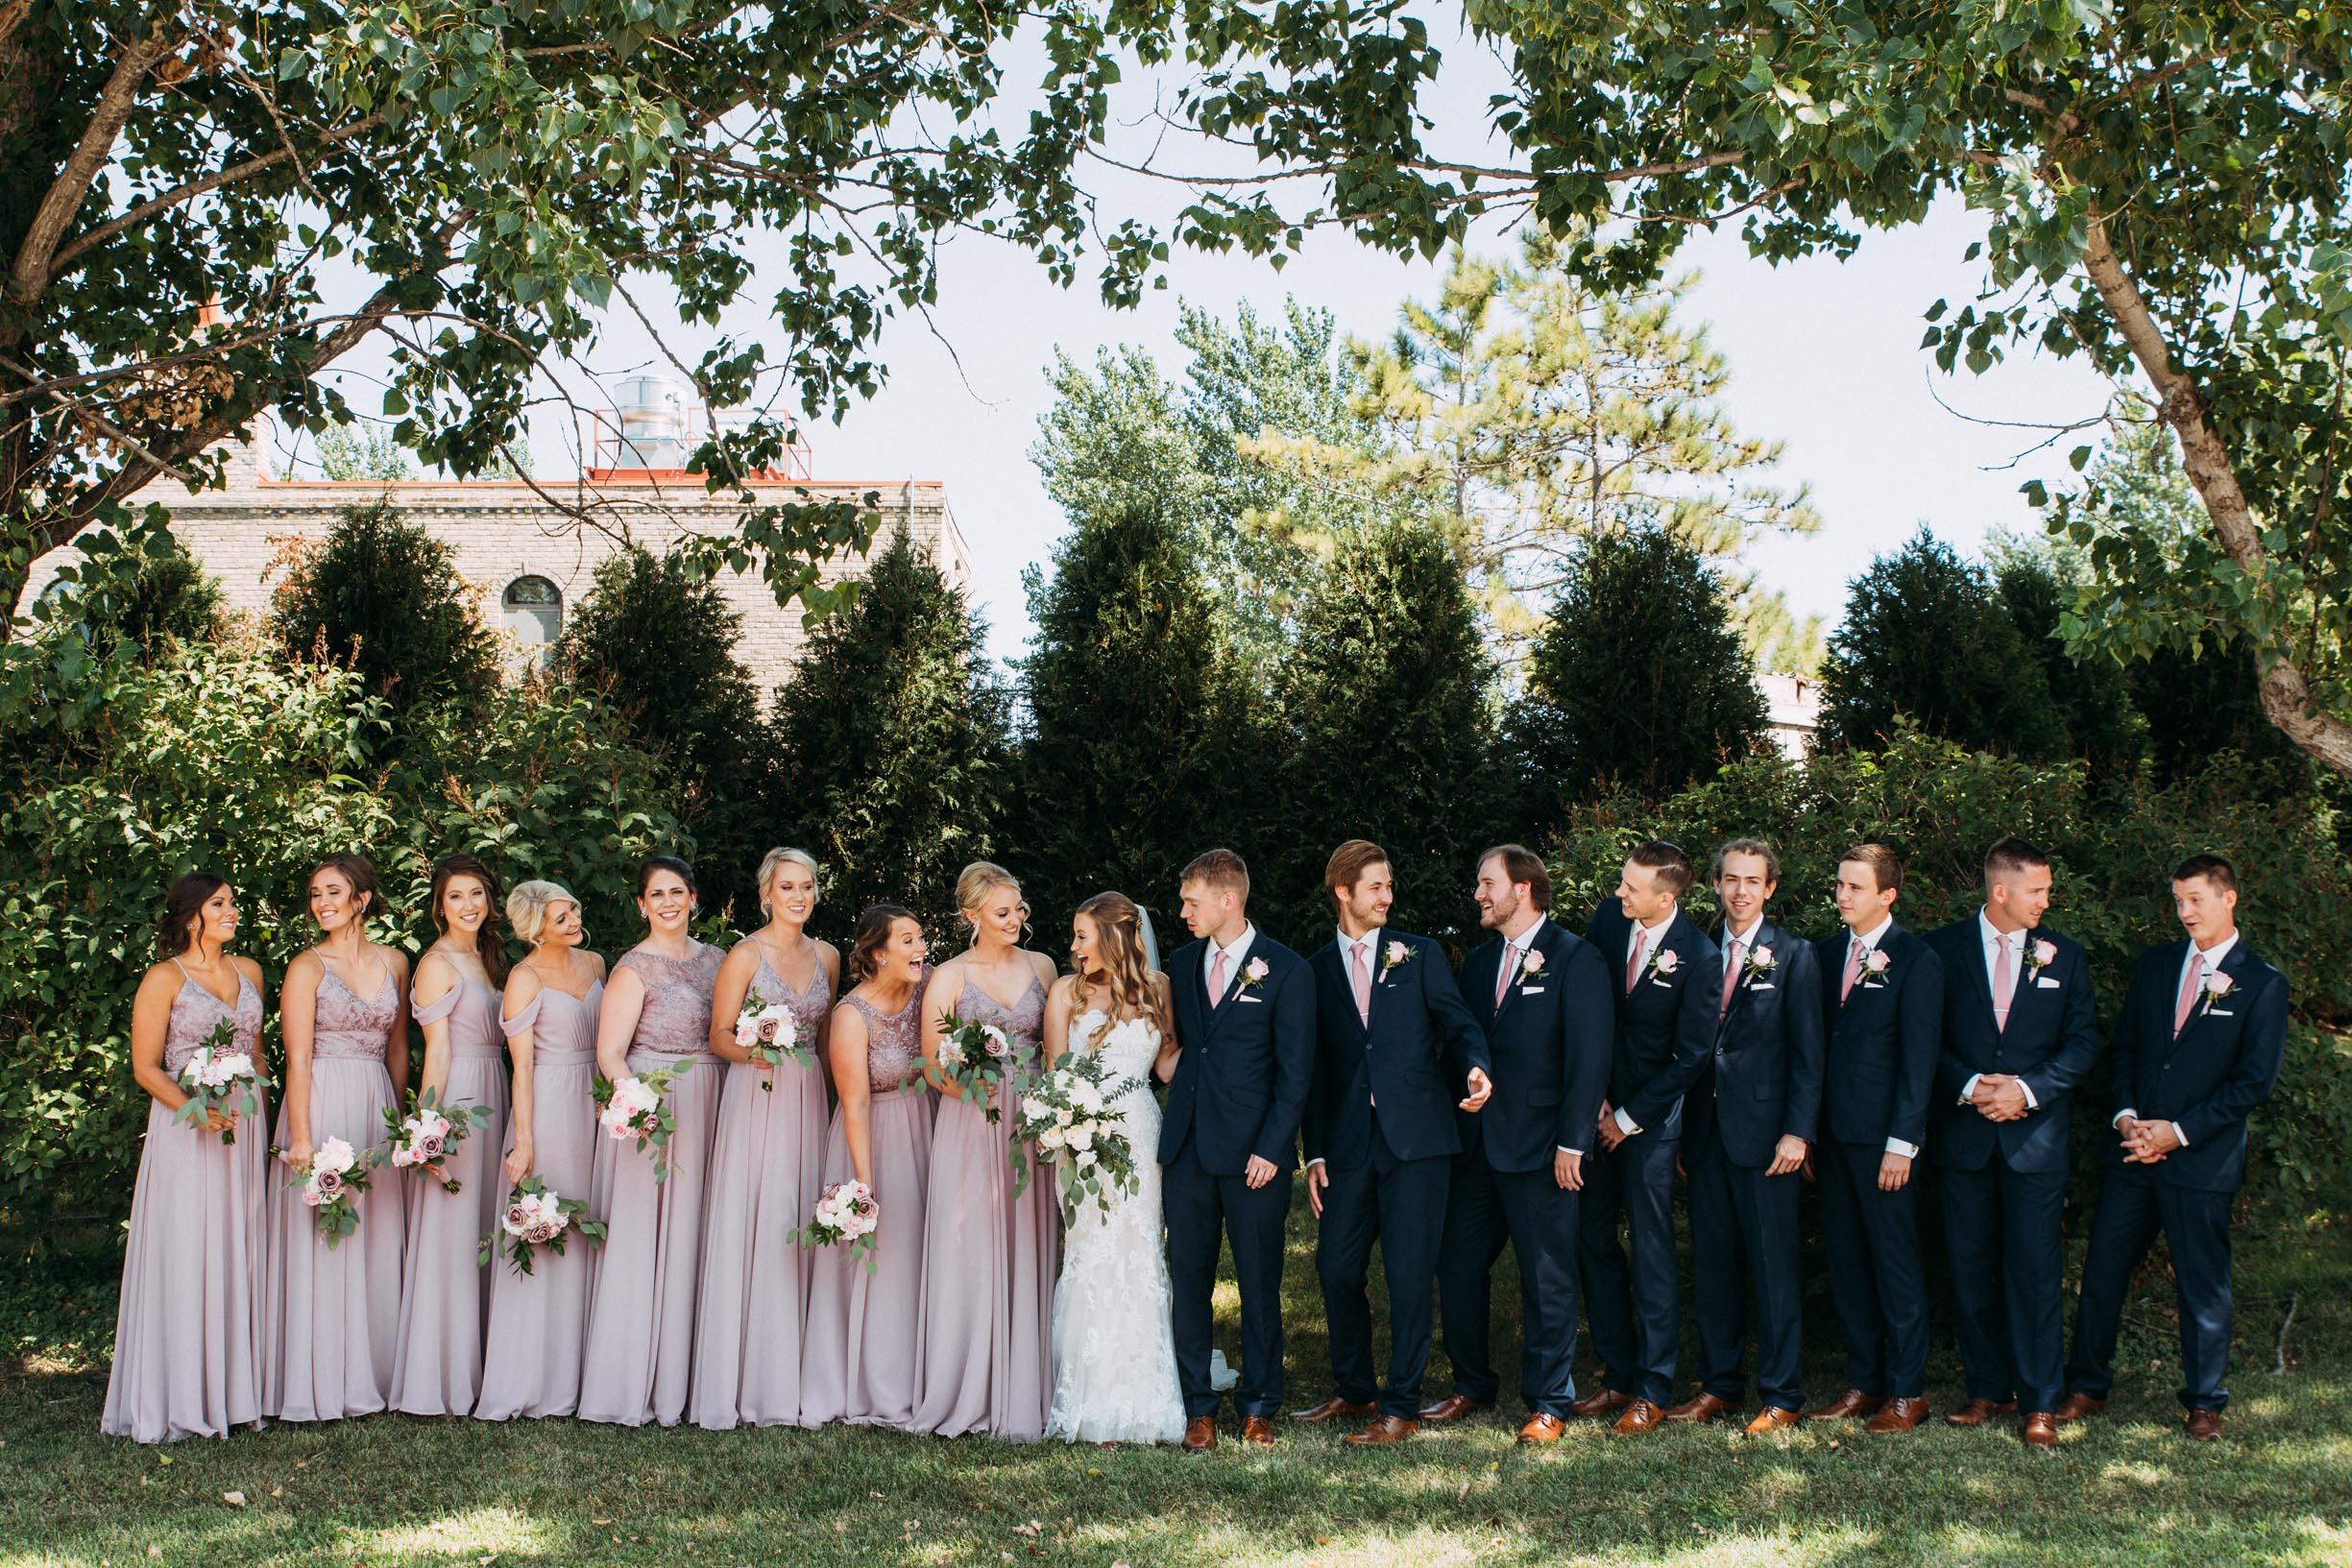 25-WeddingsattheBroz_Minnesota_WeddingBlog_WeddingParty.jpg